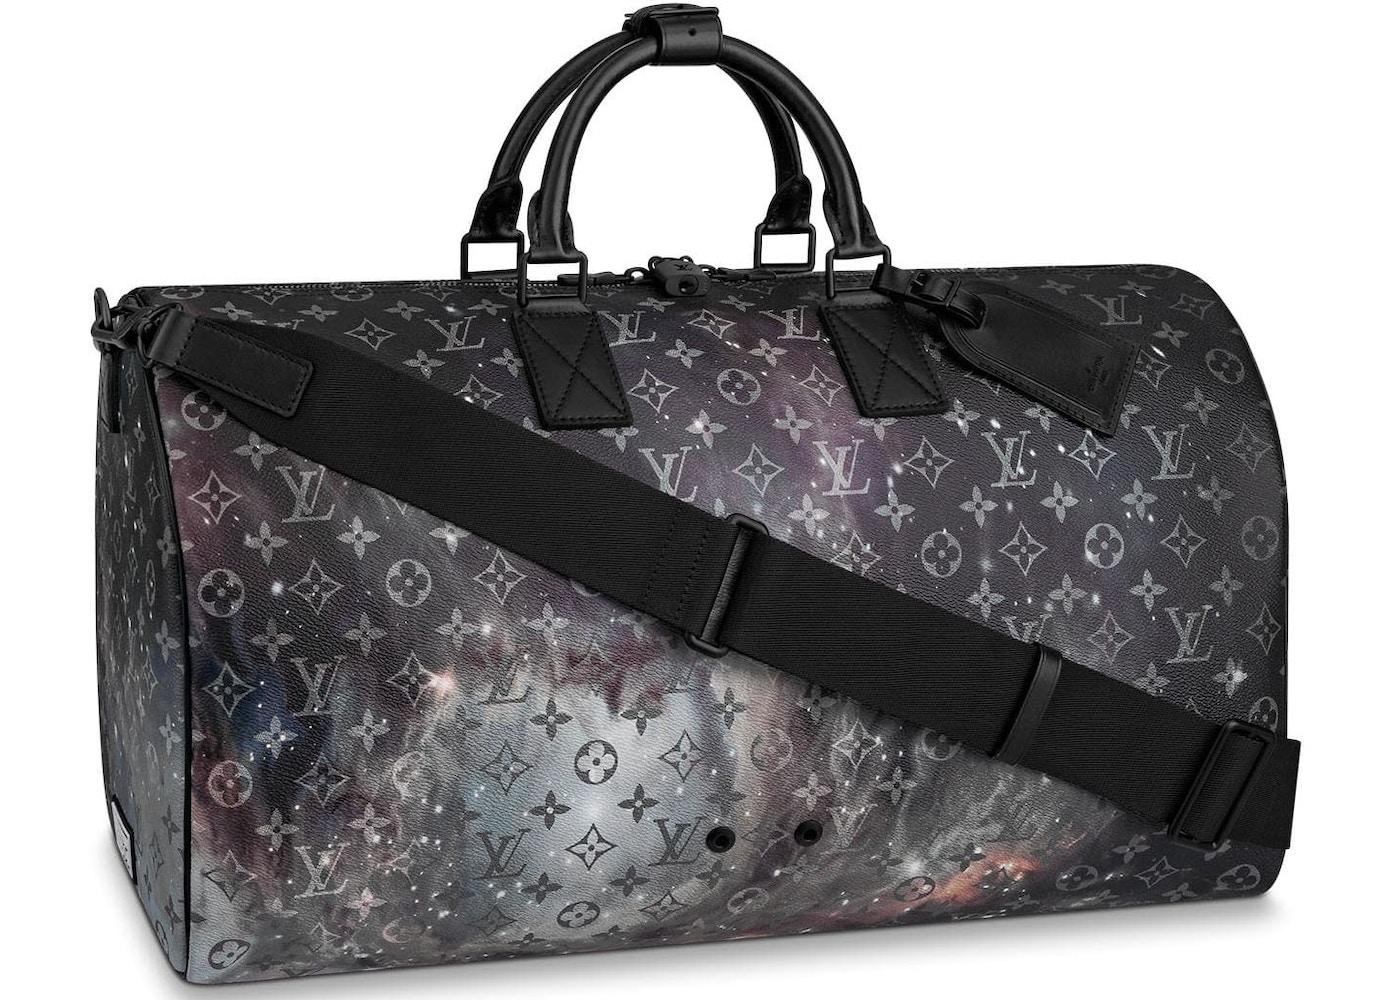 29b6b18a36ccd Buy & Sell Luxury Handbags - Average Sale Price